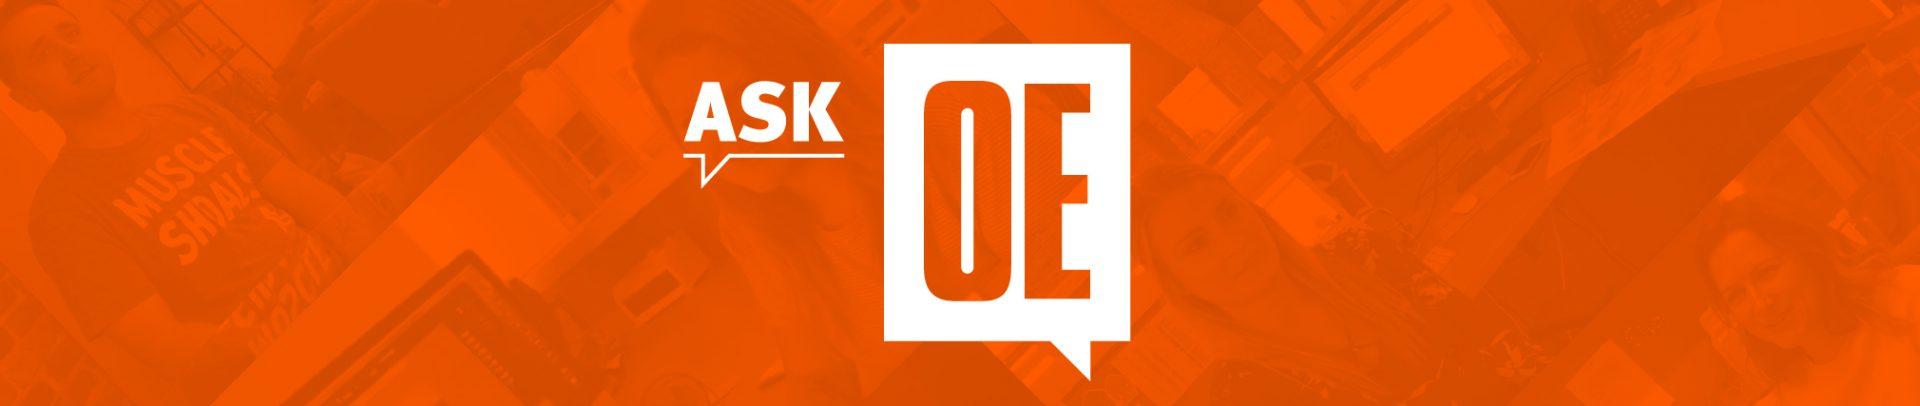 Ask OE